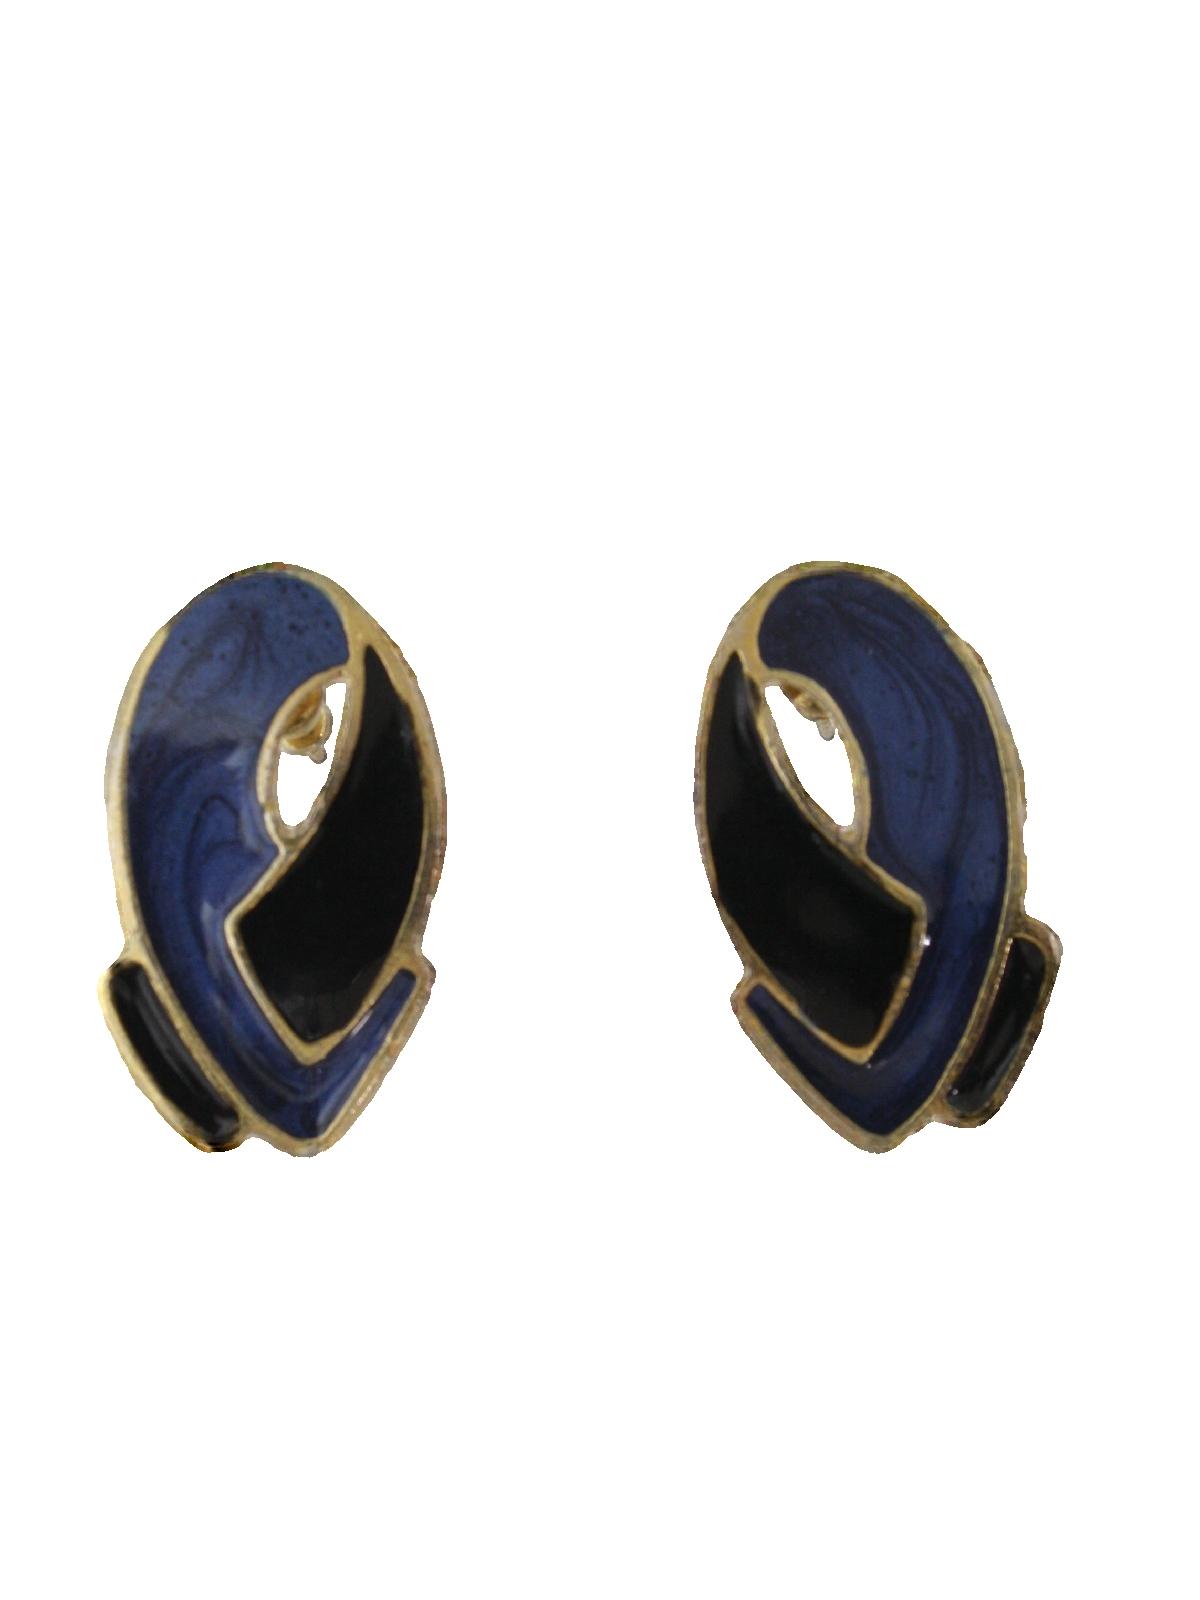 05c1bbdbc900b 1980's Womens Jewelry Totally 80s Earrings